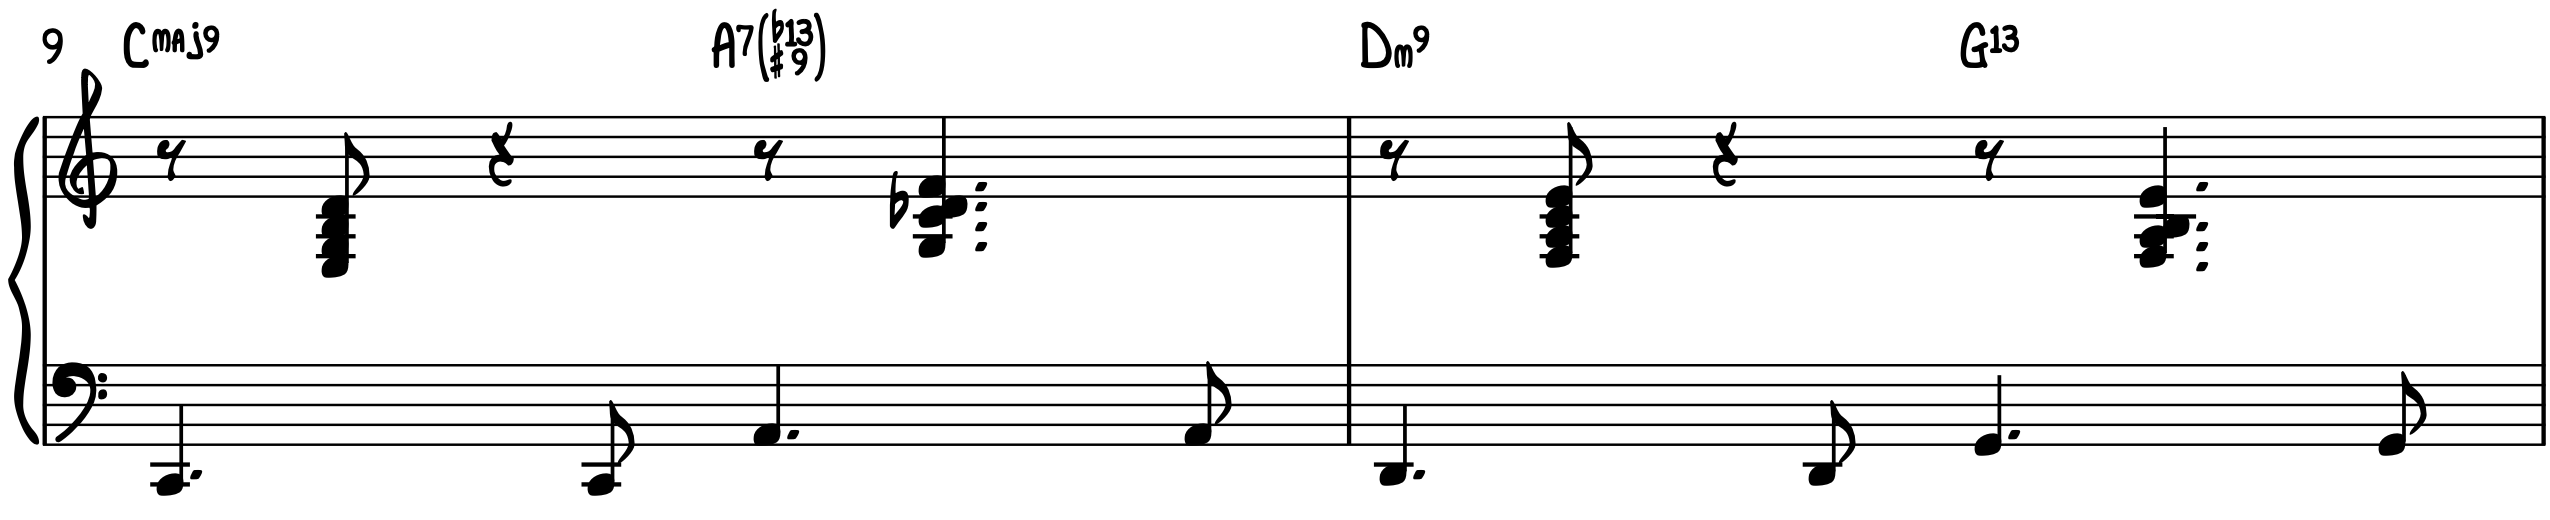 Blue Moon 2-Feel jazz piano accompaniment turnaround progression rootless voicings